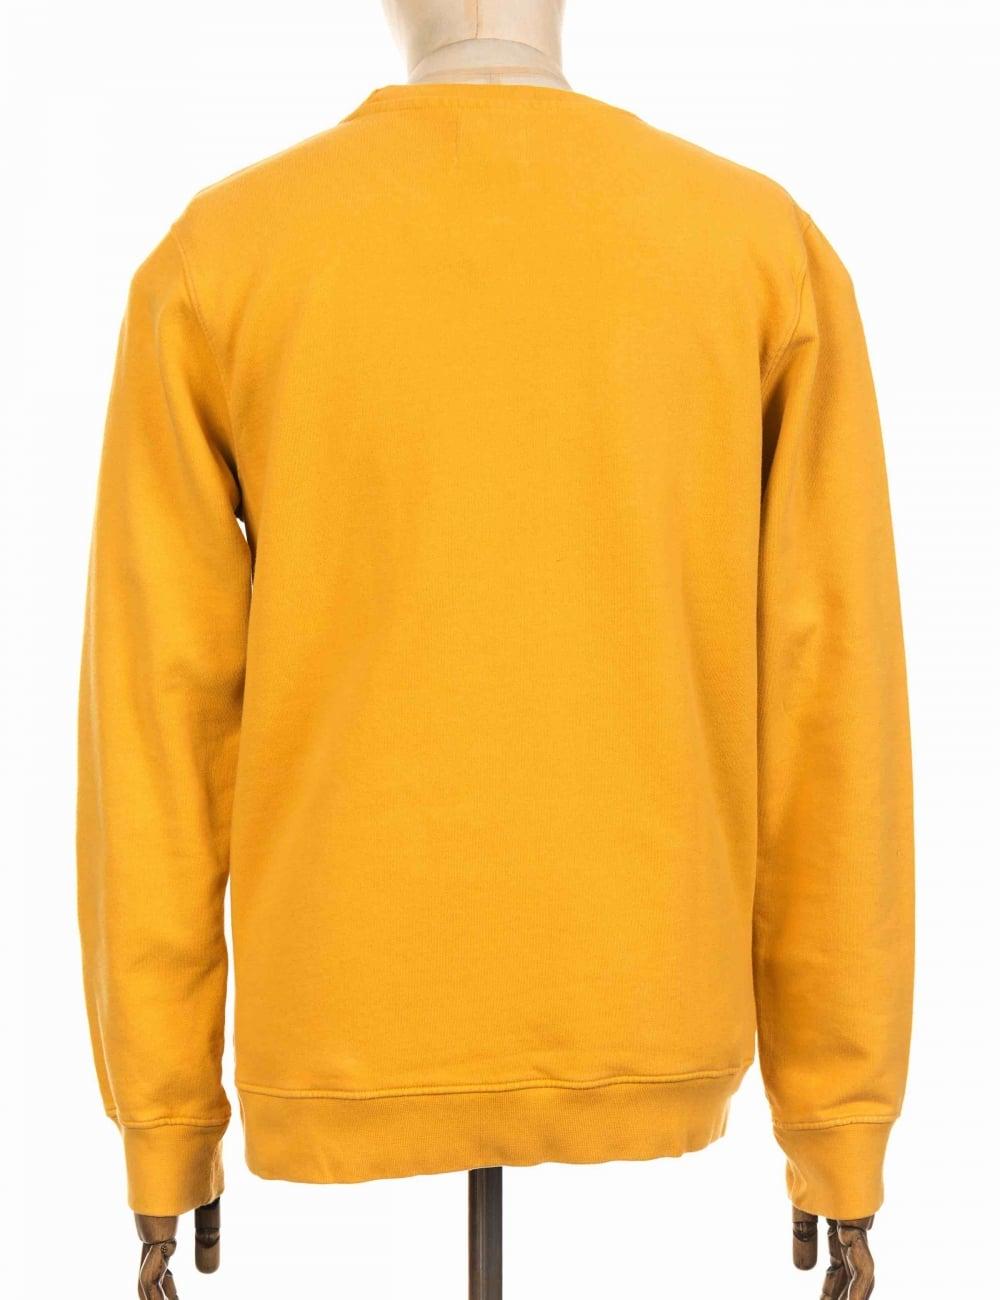 5206948a Colorful Standard Organic Cotton Sweatshirt - Burned Yellow ...